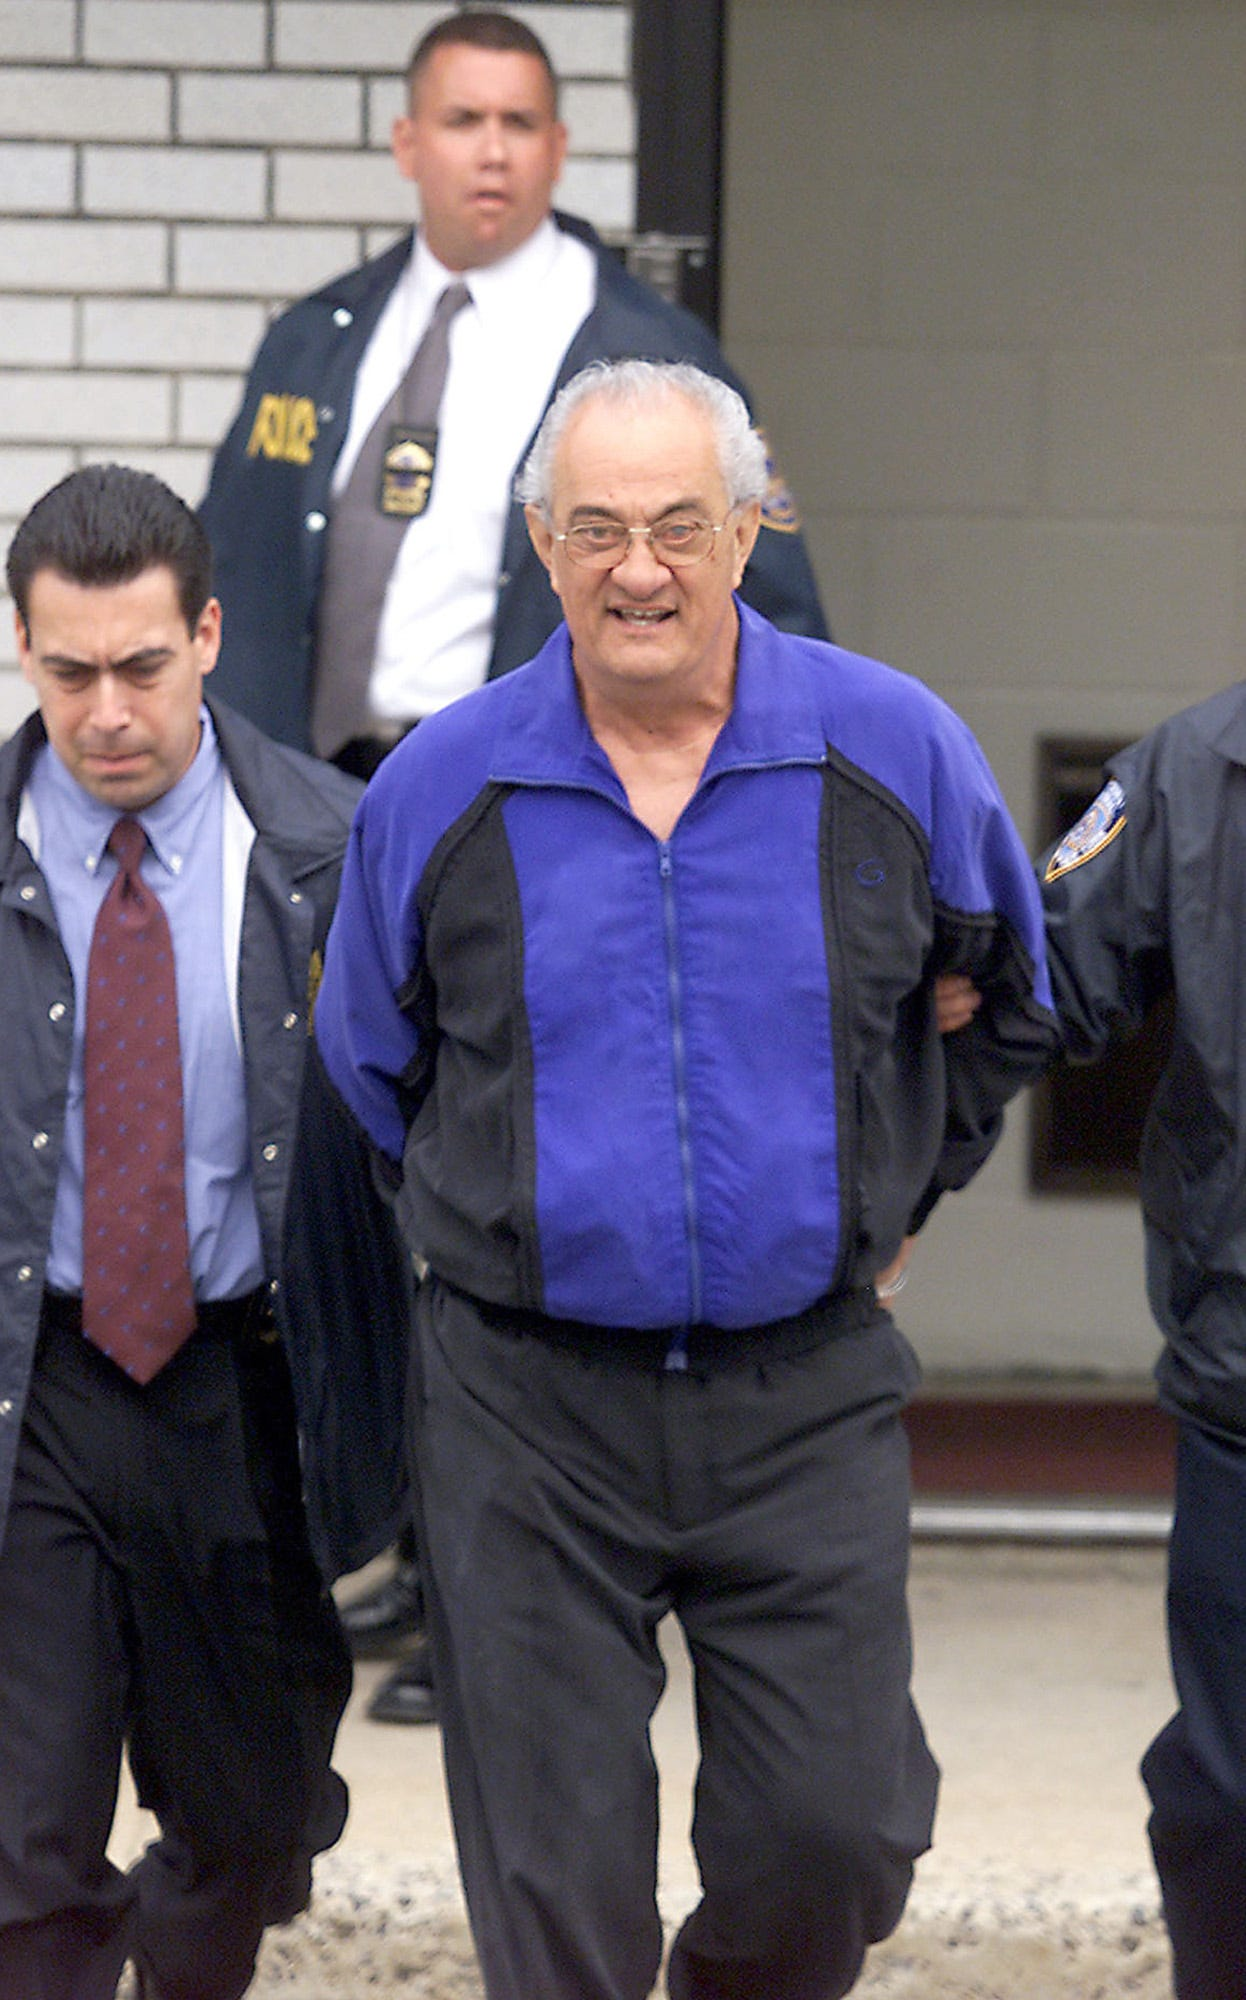 Peter Gotti of Gambino Mafia family seeks early release from prison